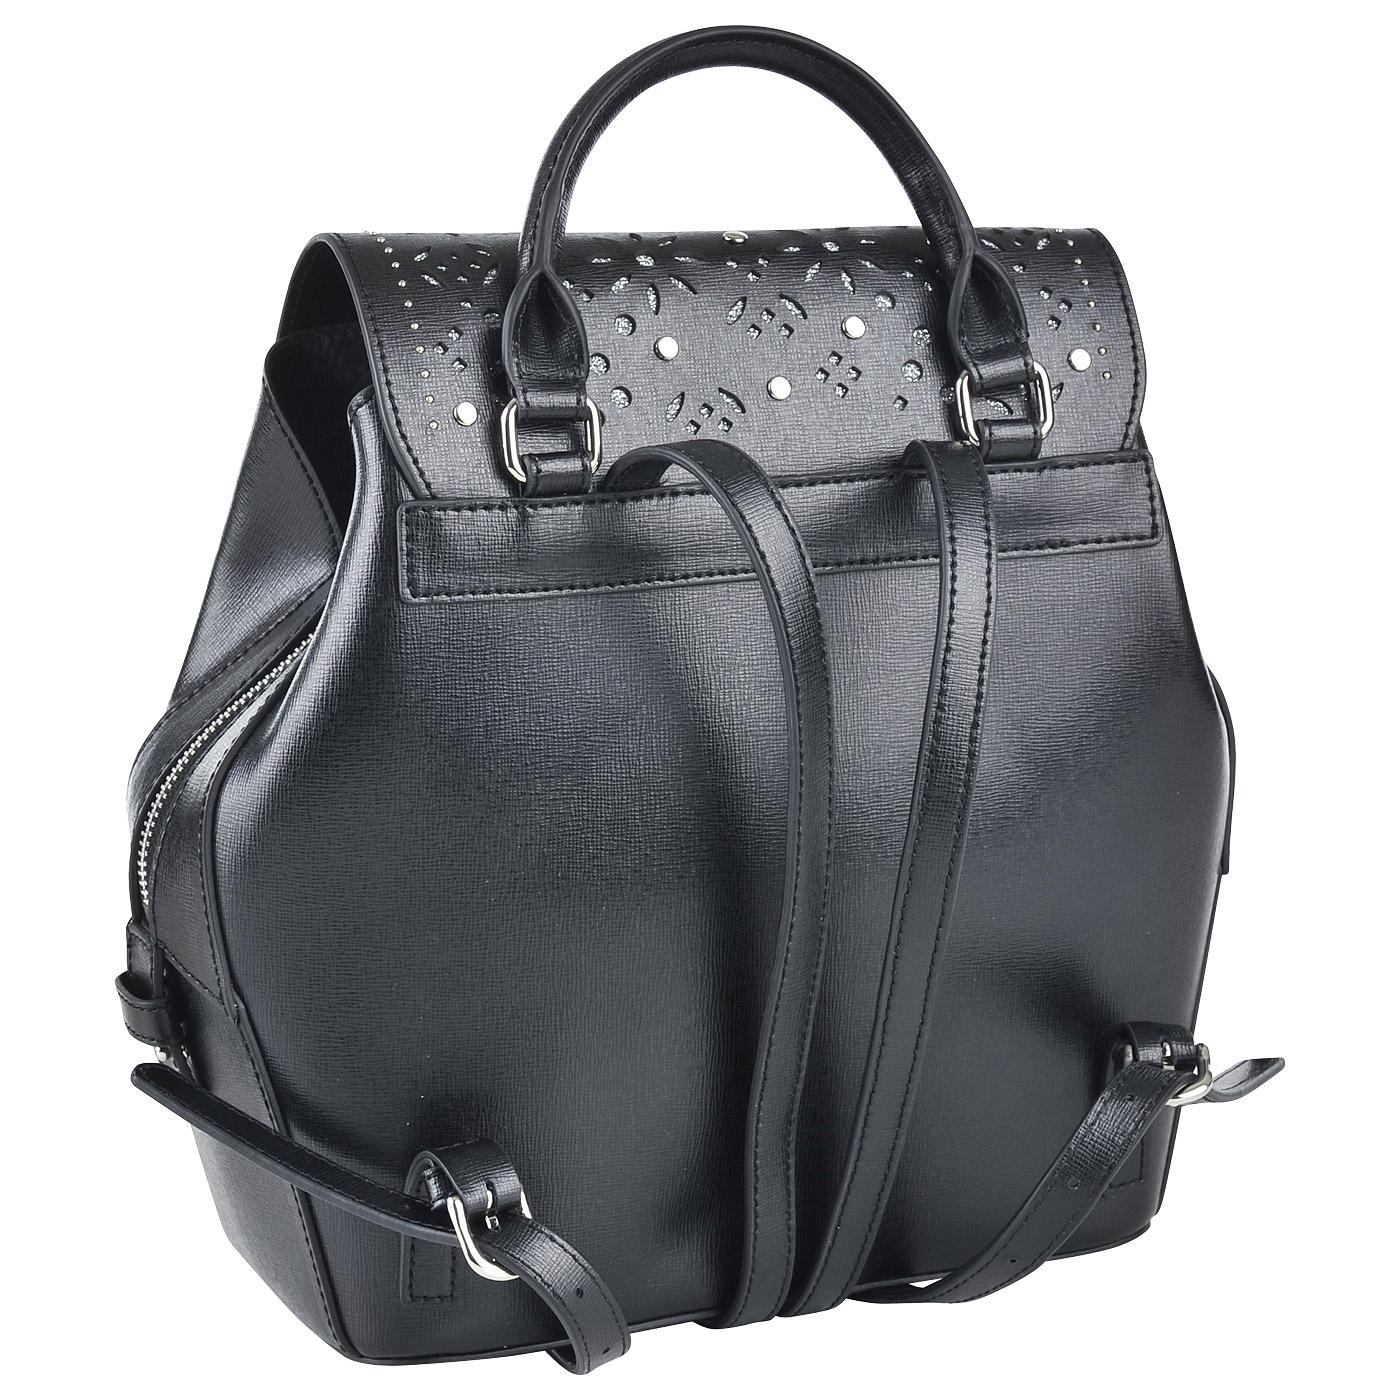 b54ead929a43 Женский кожаный рюкзак Cromia Lola 1403231_nero - 2000557669611 ...